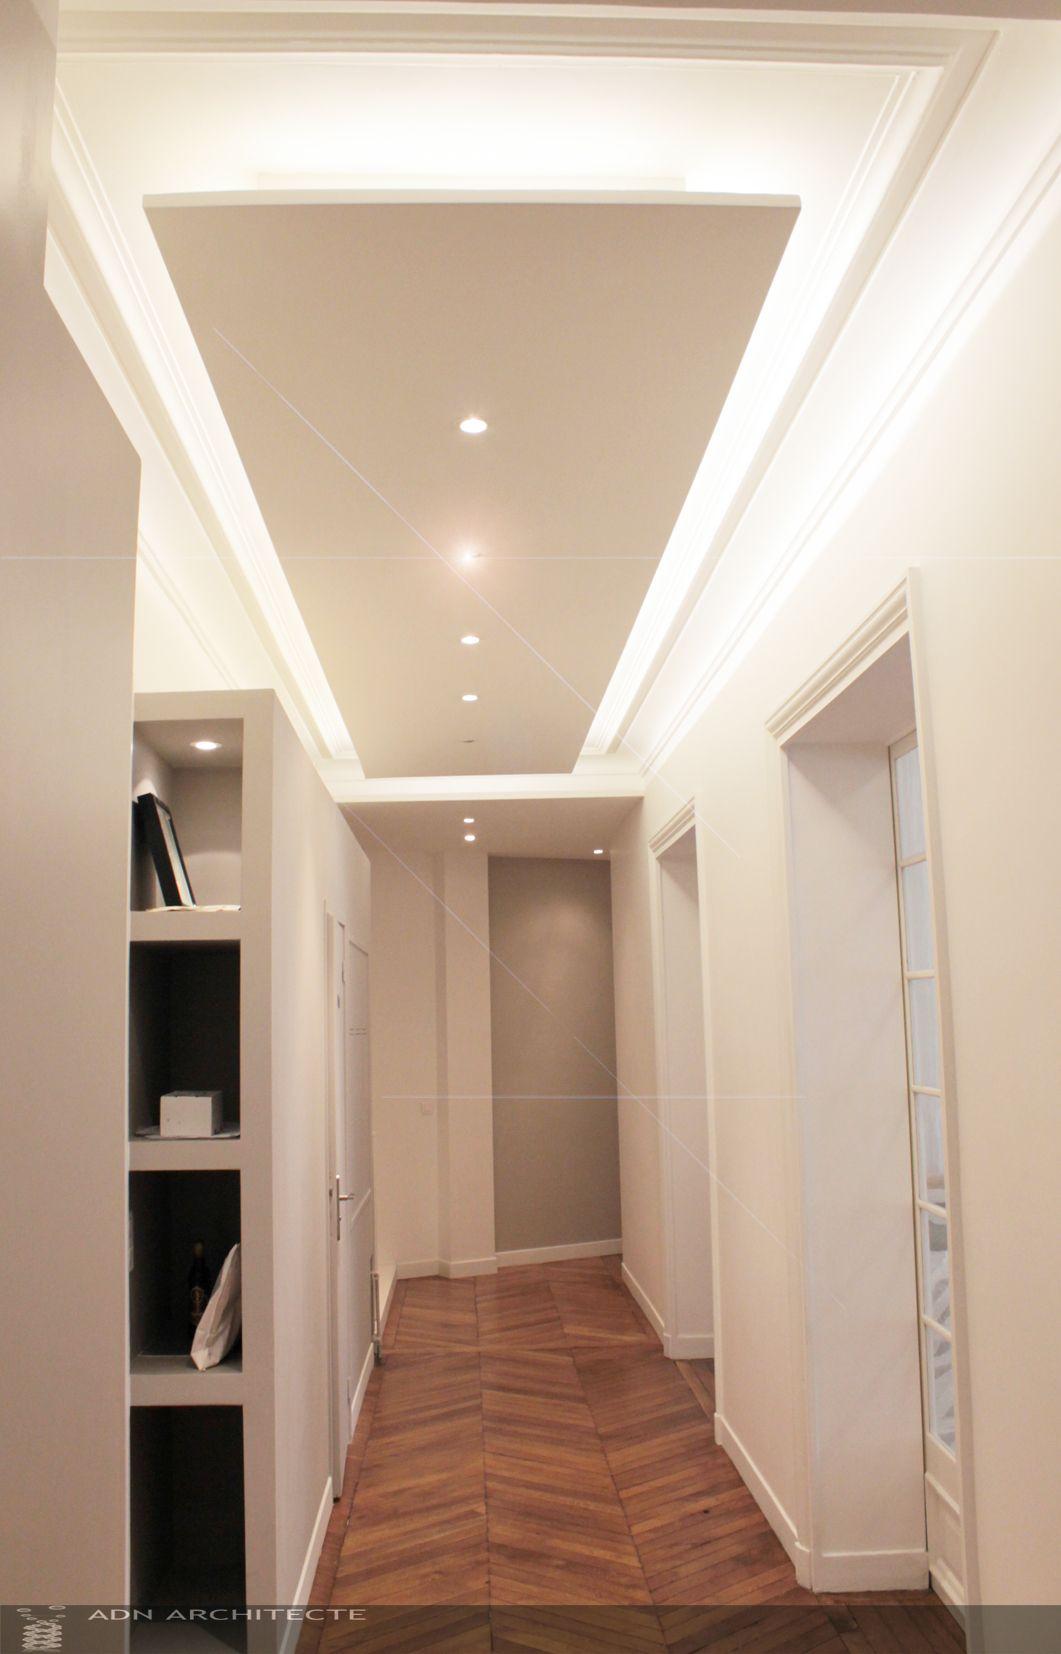 BRUYERES - RencontreUnArchi.com | Salle de bain en 2019 ...